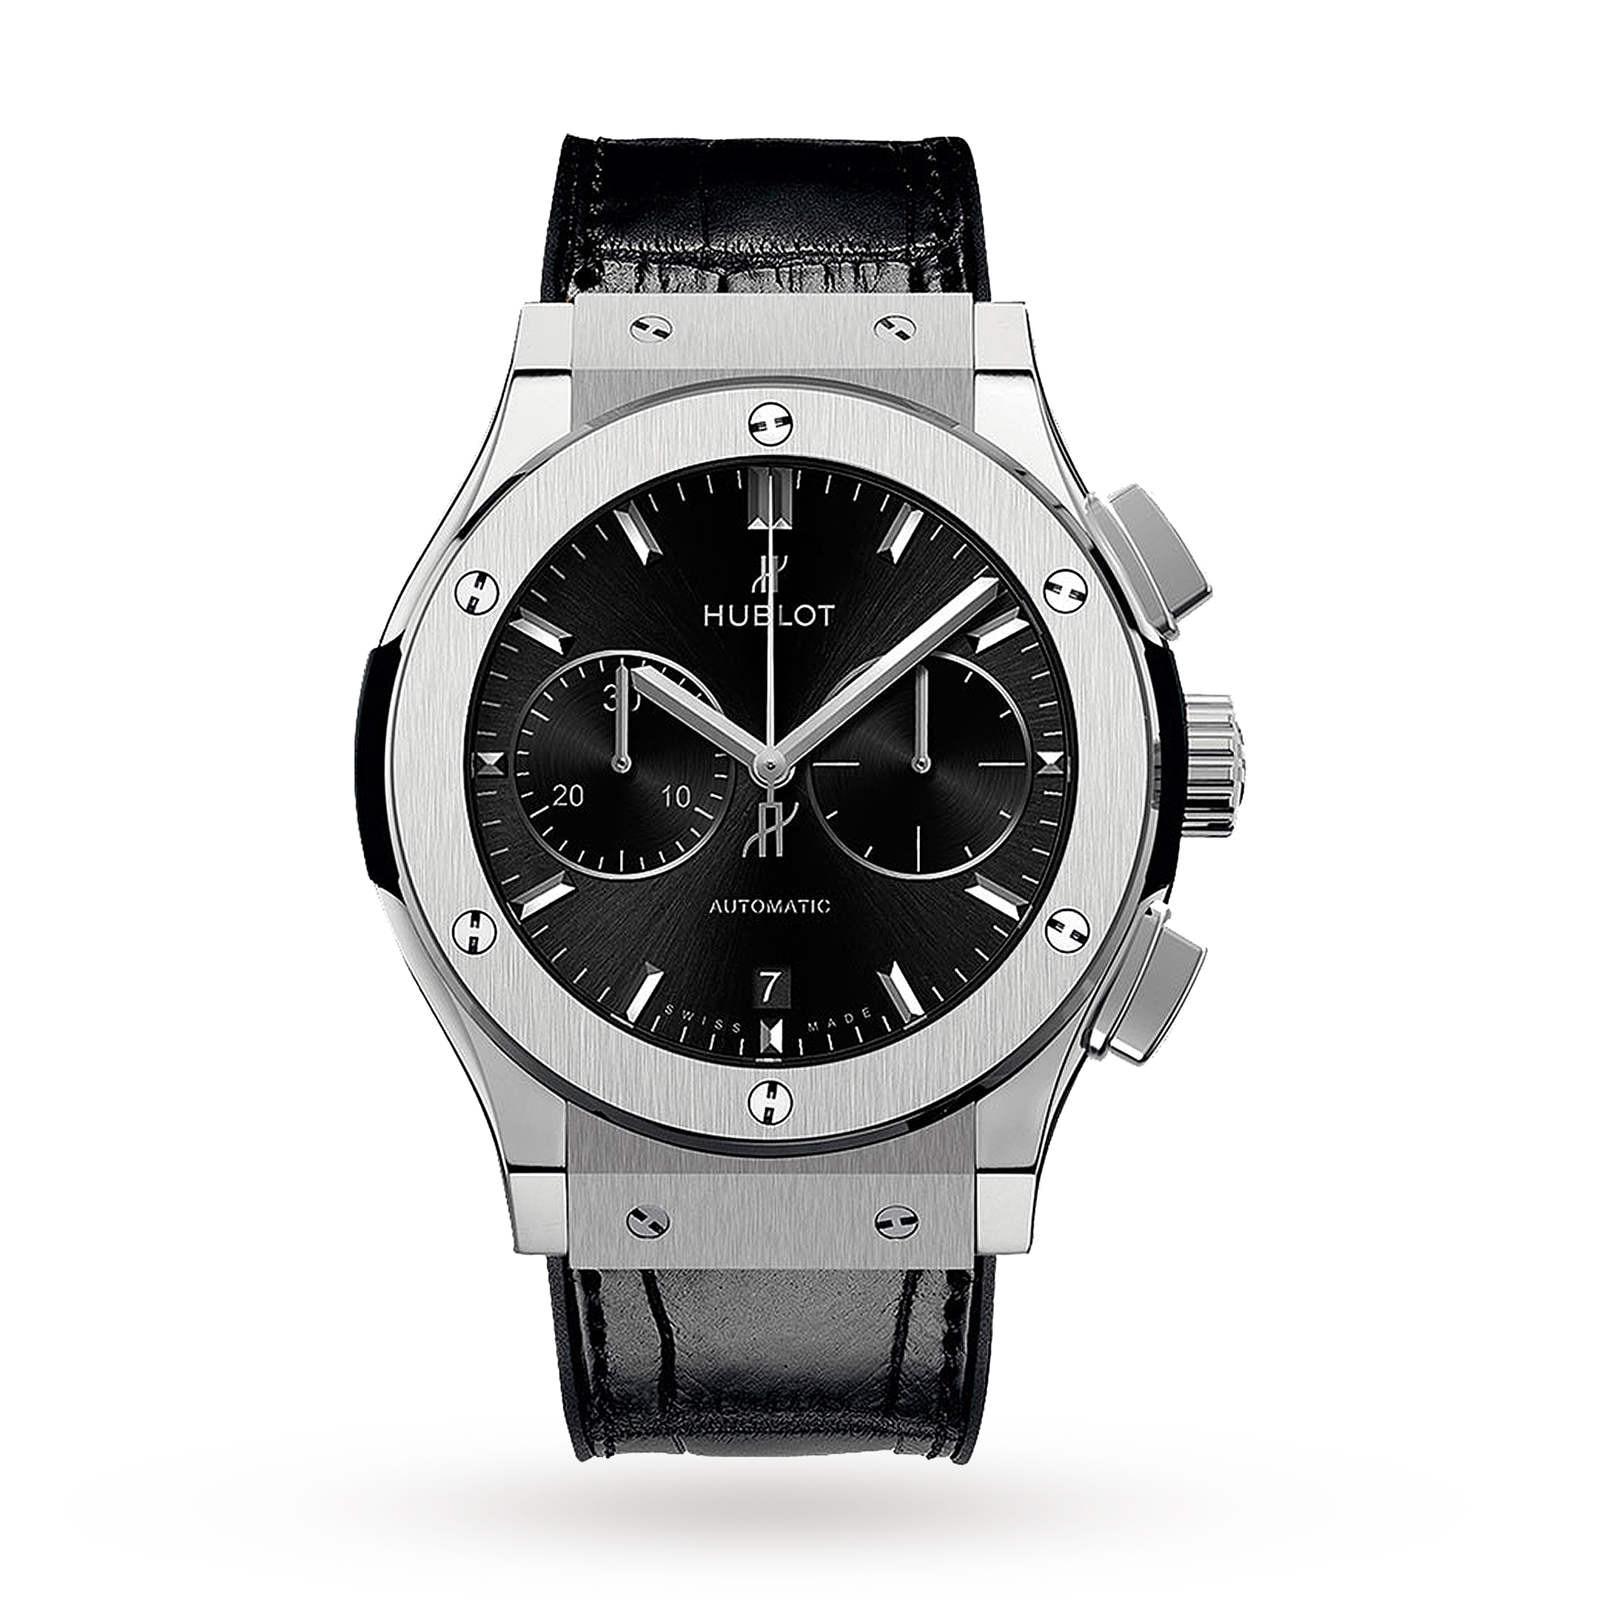 Hublot Hublot Classic Fusion Chronograph Titanium 42mm Mens Watch